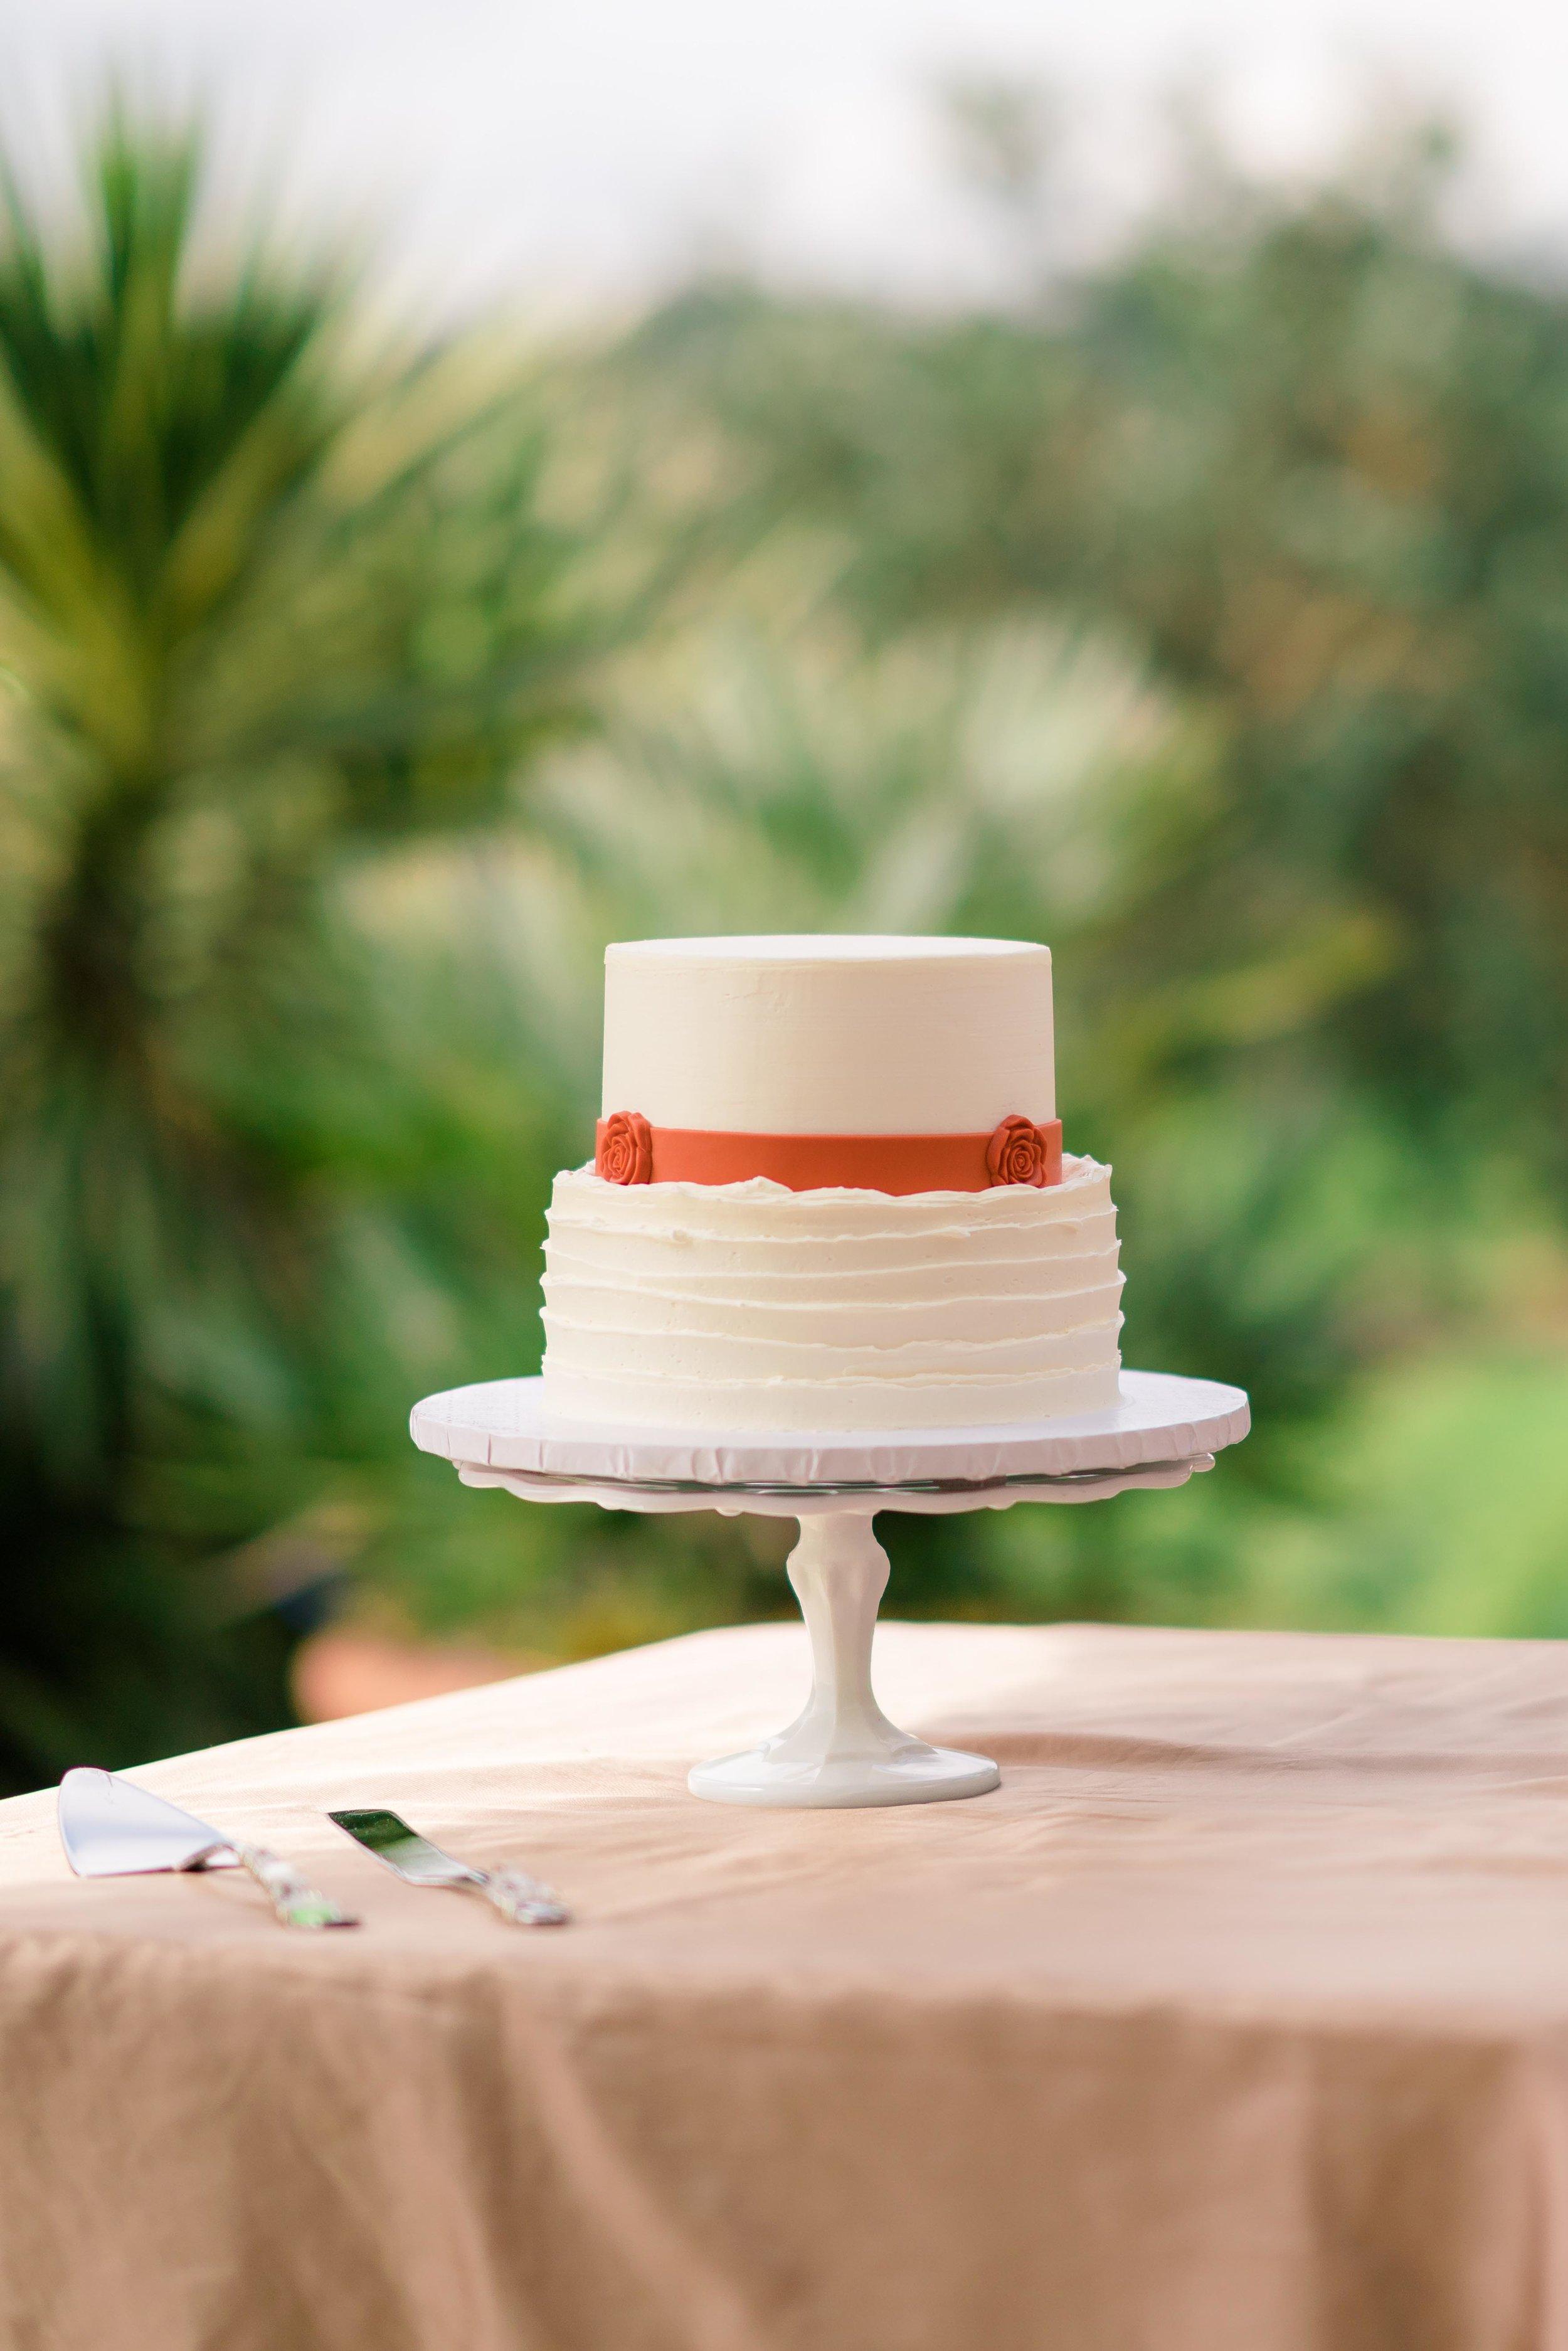 All4fun wedding cakes are Oregon City's best wedding cake.